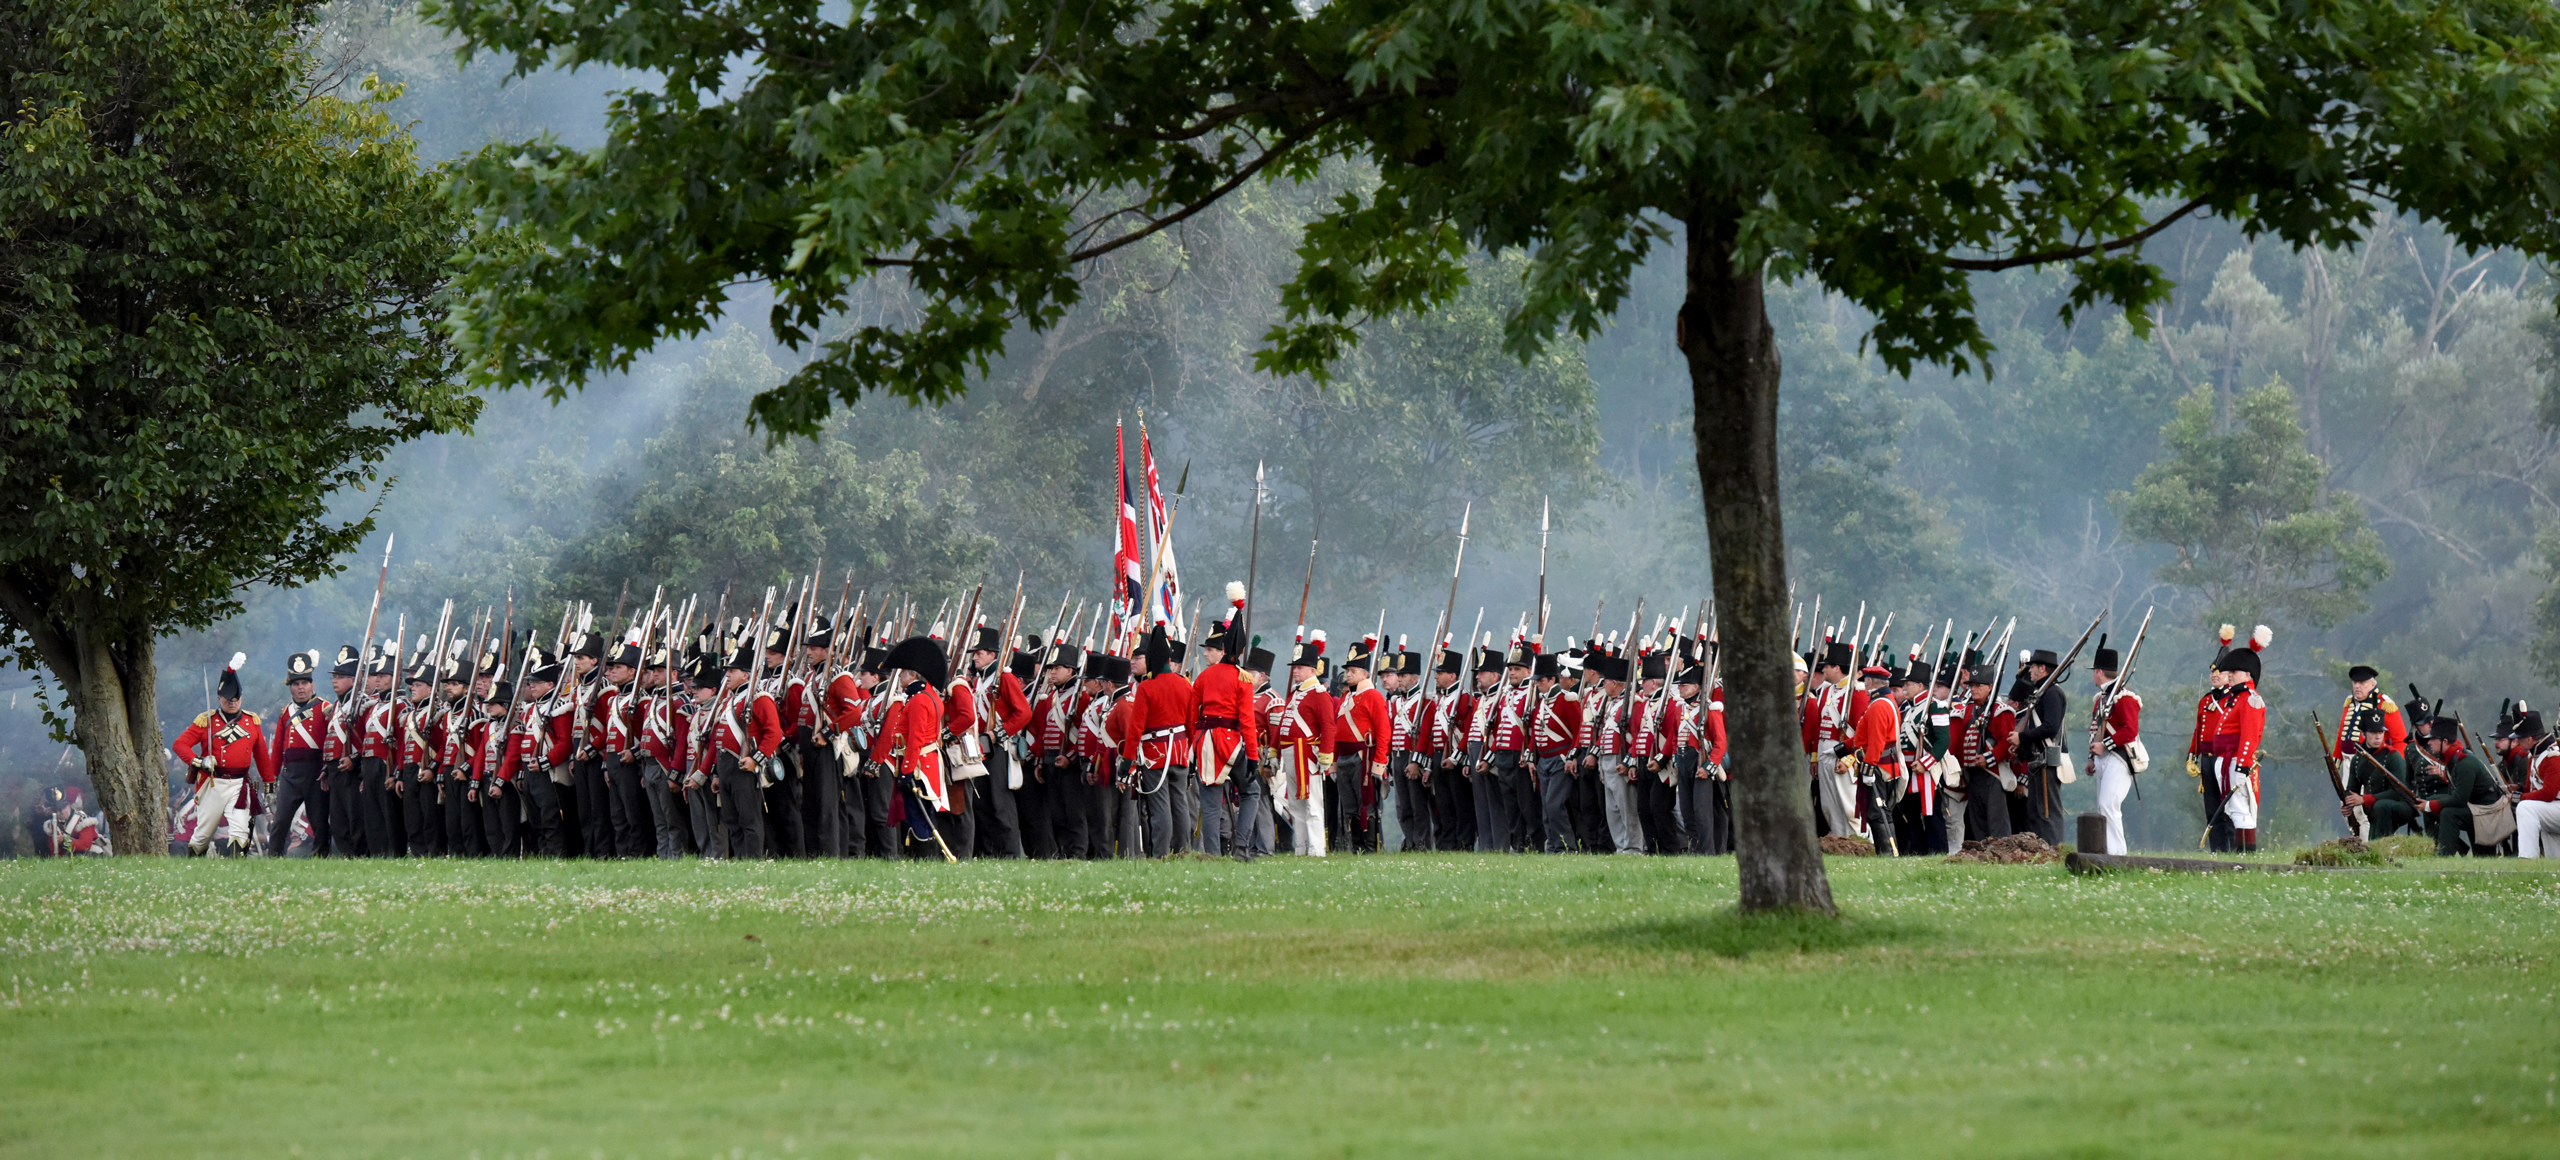 A blast of Niagara's fascinating history